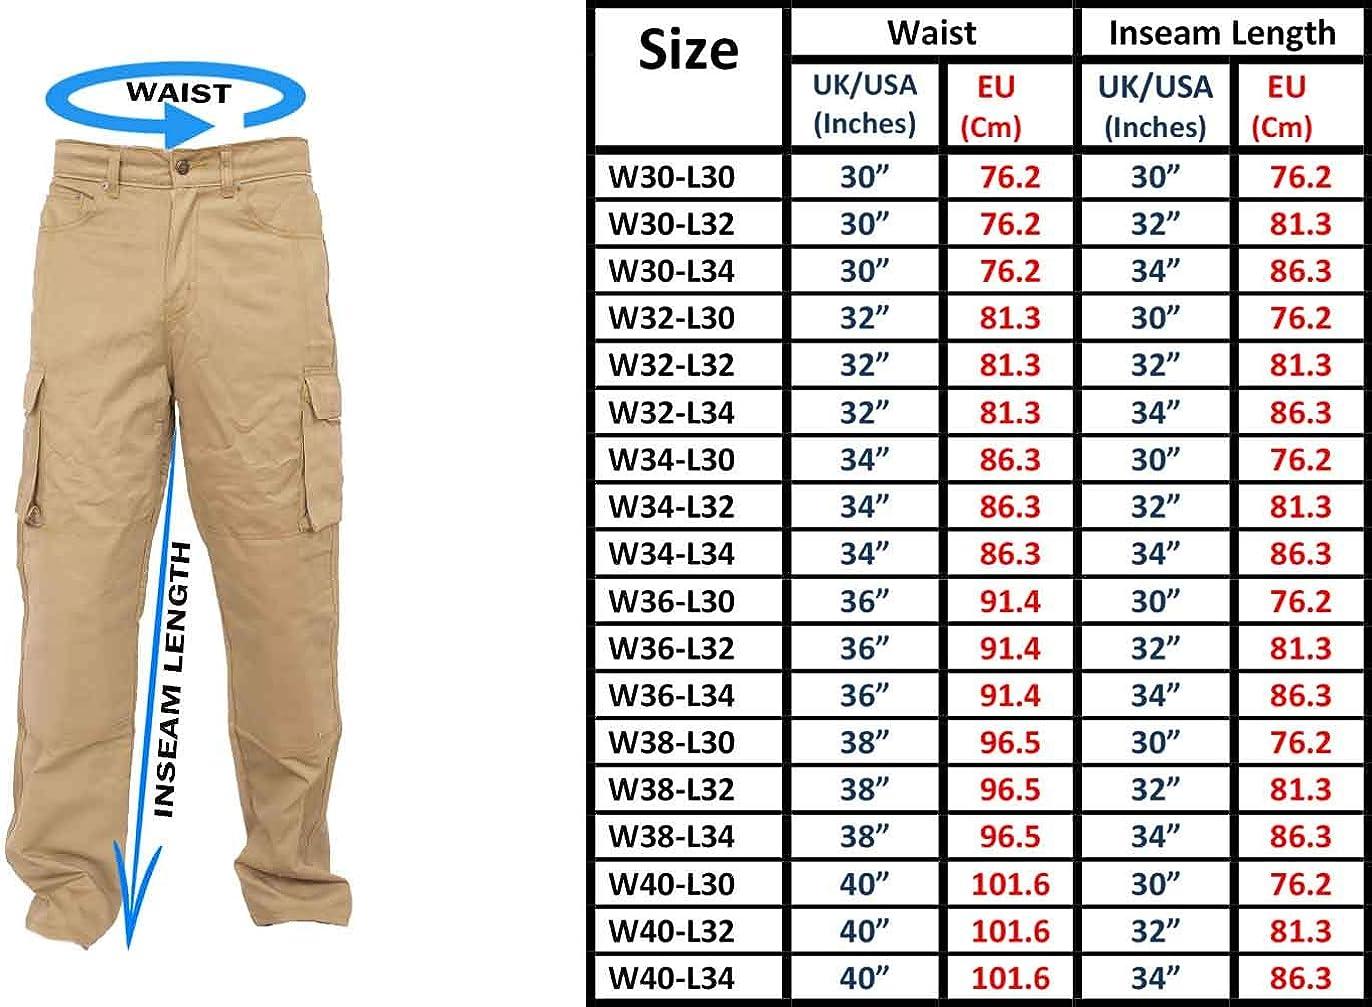 Newfacelook Mens pantaloni Cargo lavorano per impieghi pesanti pantaloni dritti montare Jeans